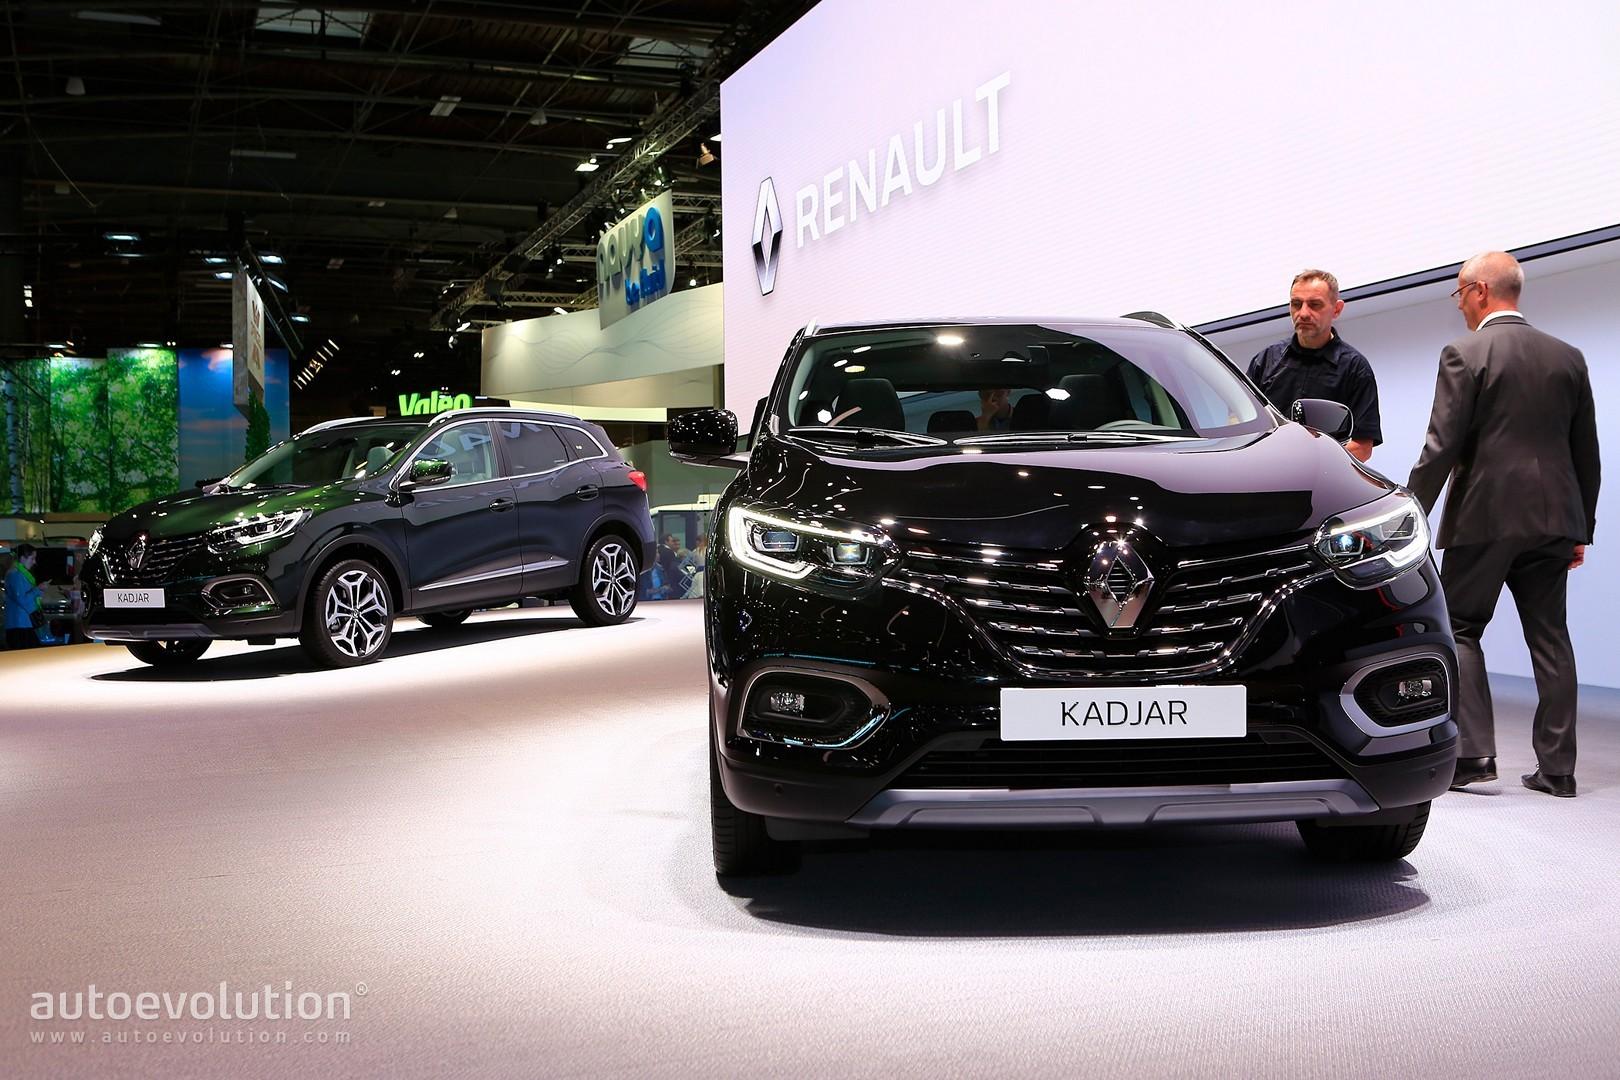 2018 - [Renault] Kadjar restylé  - Page 16 2019-renault-kadjar-is-a-simple-but-affective-facelift-in-paris_15